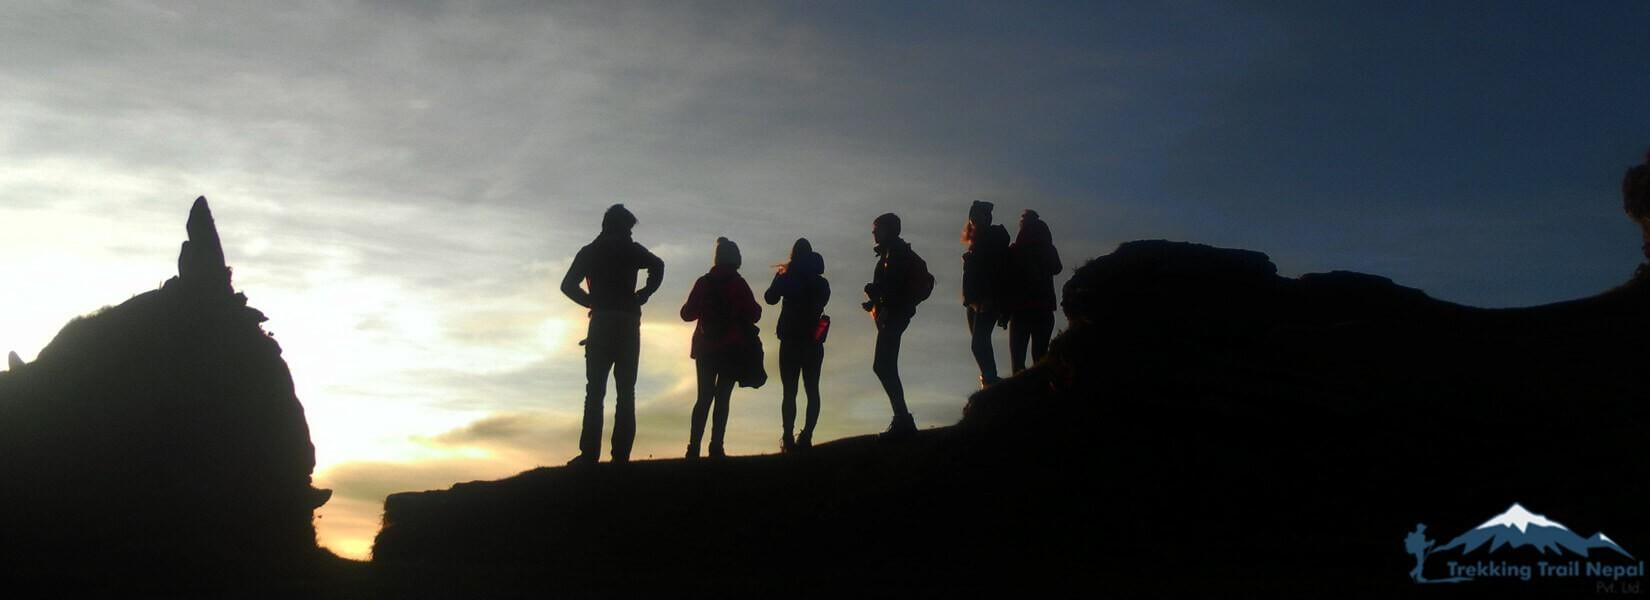 Pikey Peak Trek